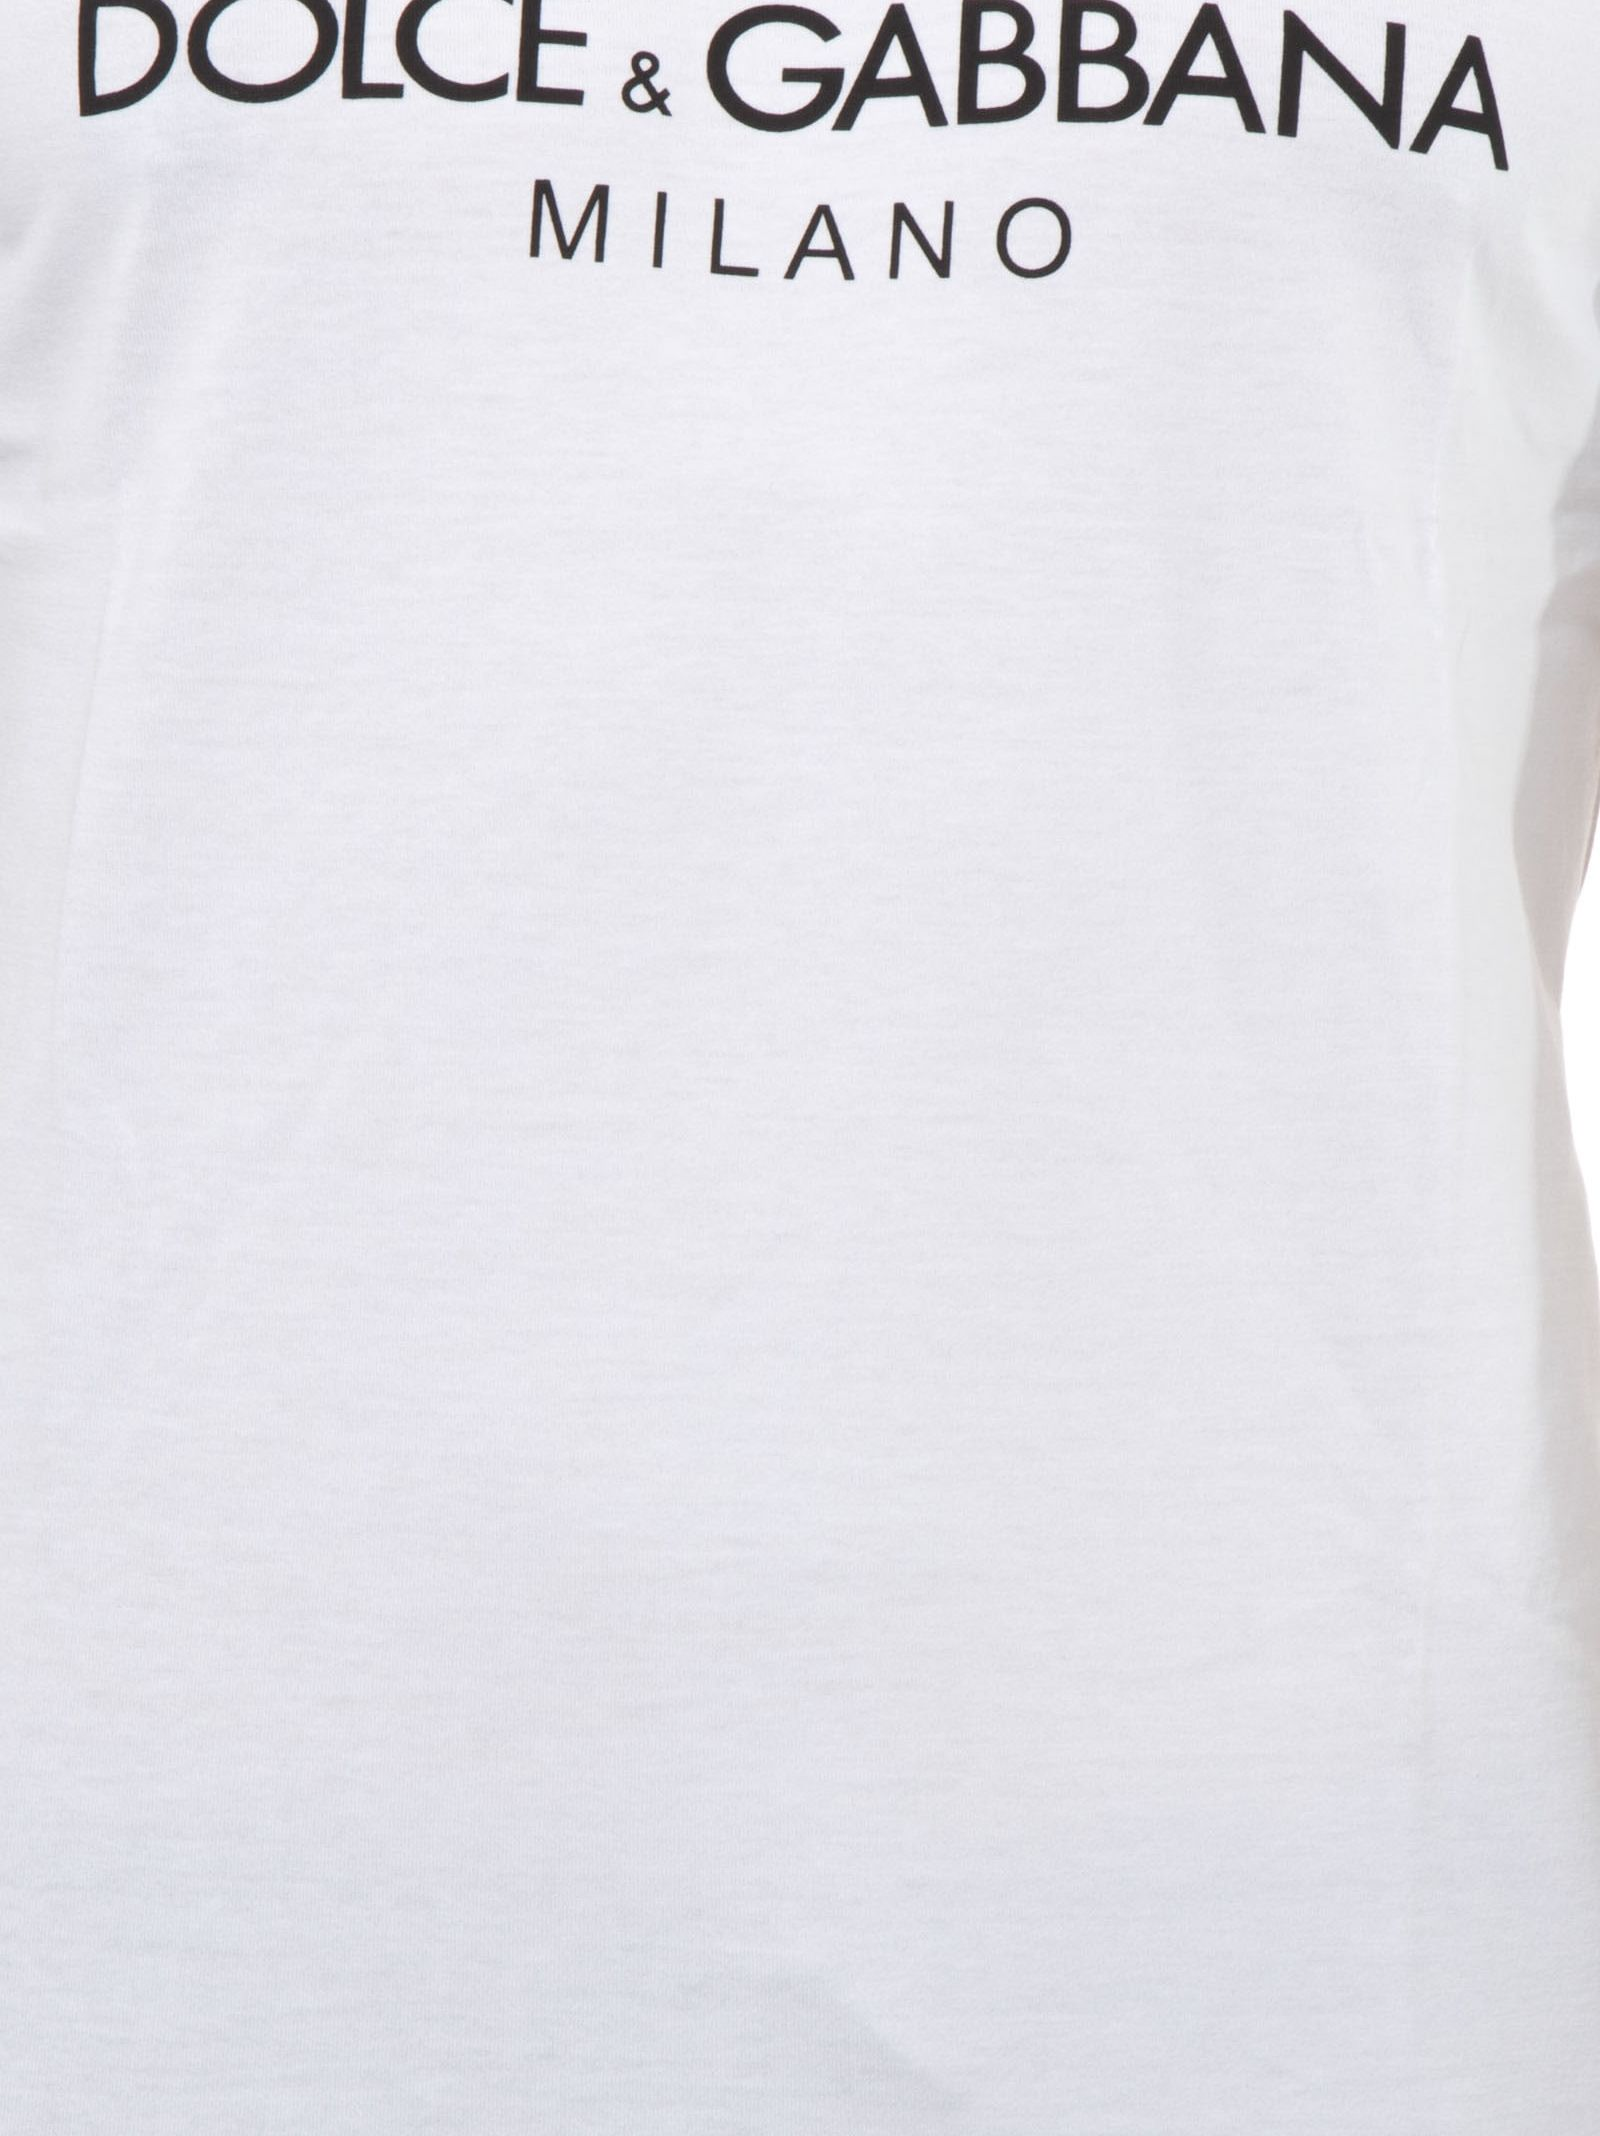 Dolce & Gabbana White Cotton T-shirt With Dolce & Gabbana Crown Print